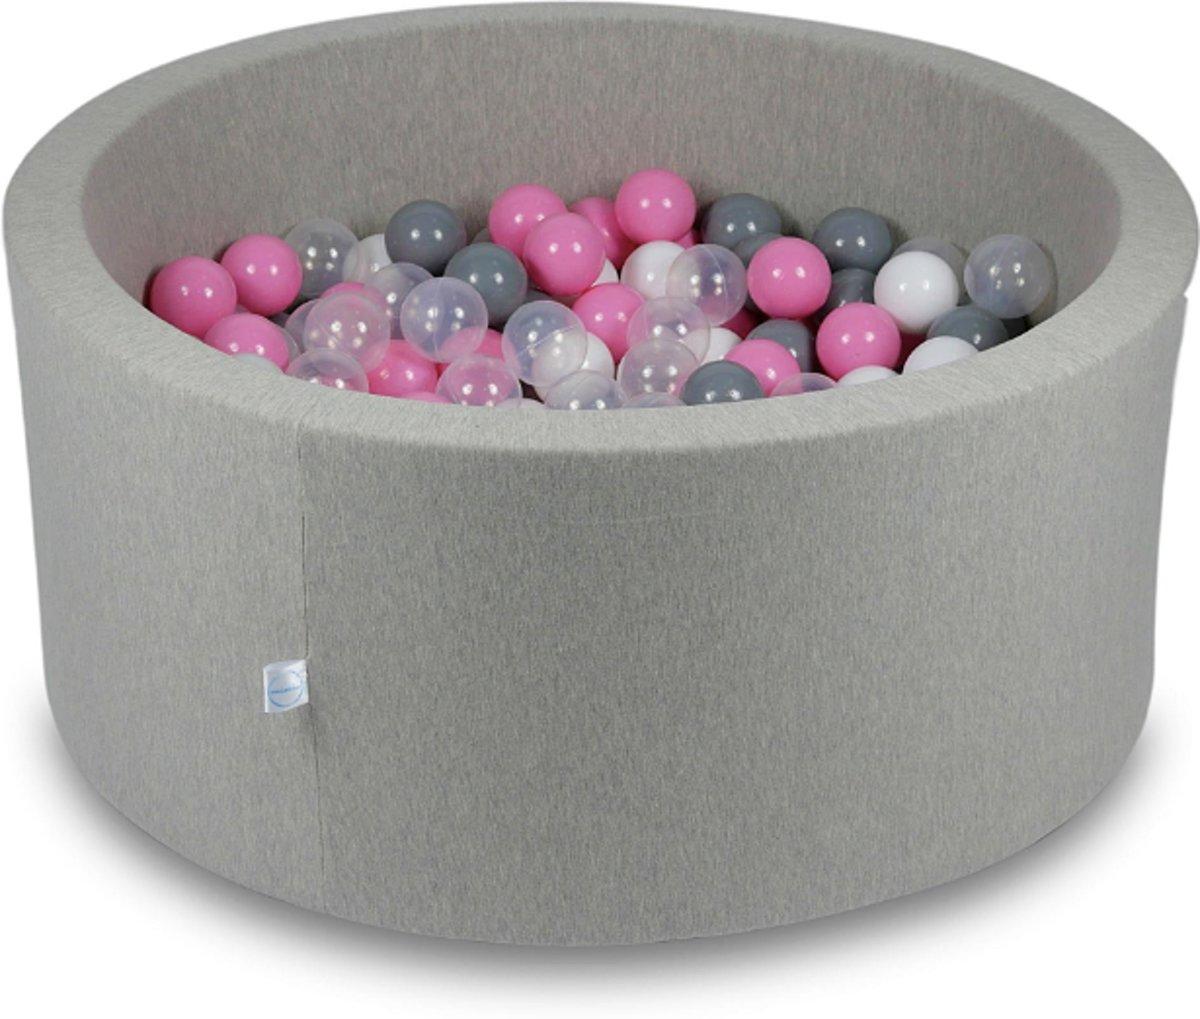 Ballenbak - 300 ballen - 90 x 40 cm - ballenbad - rond grijs